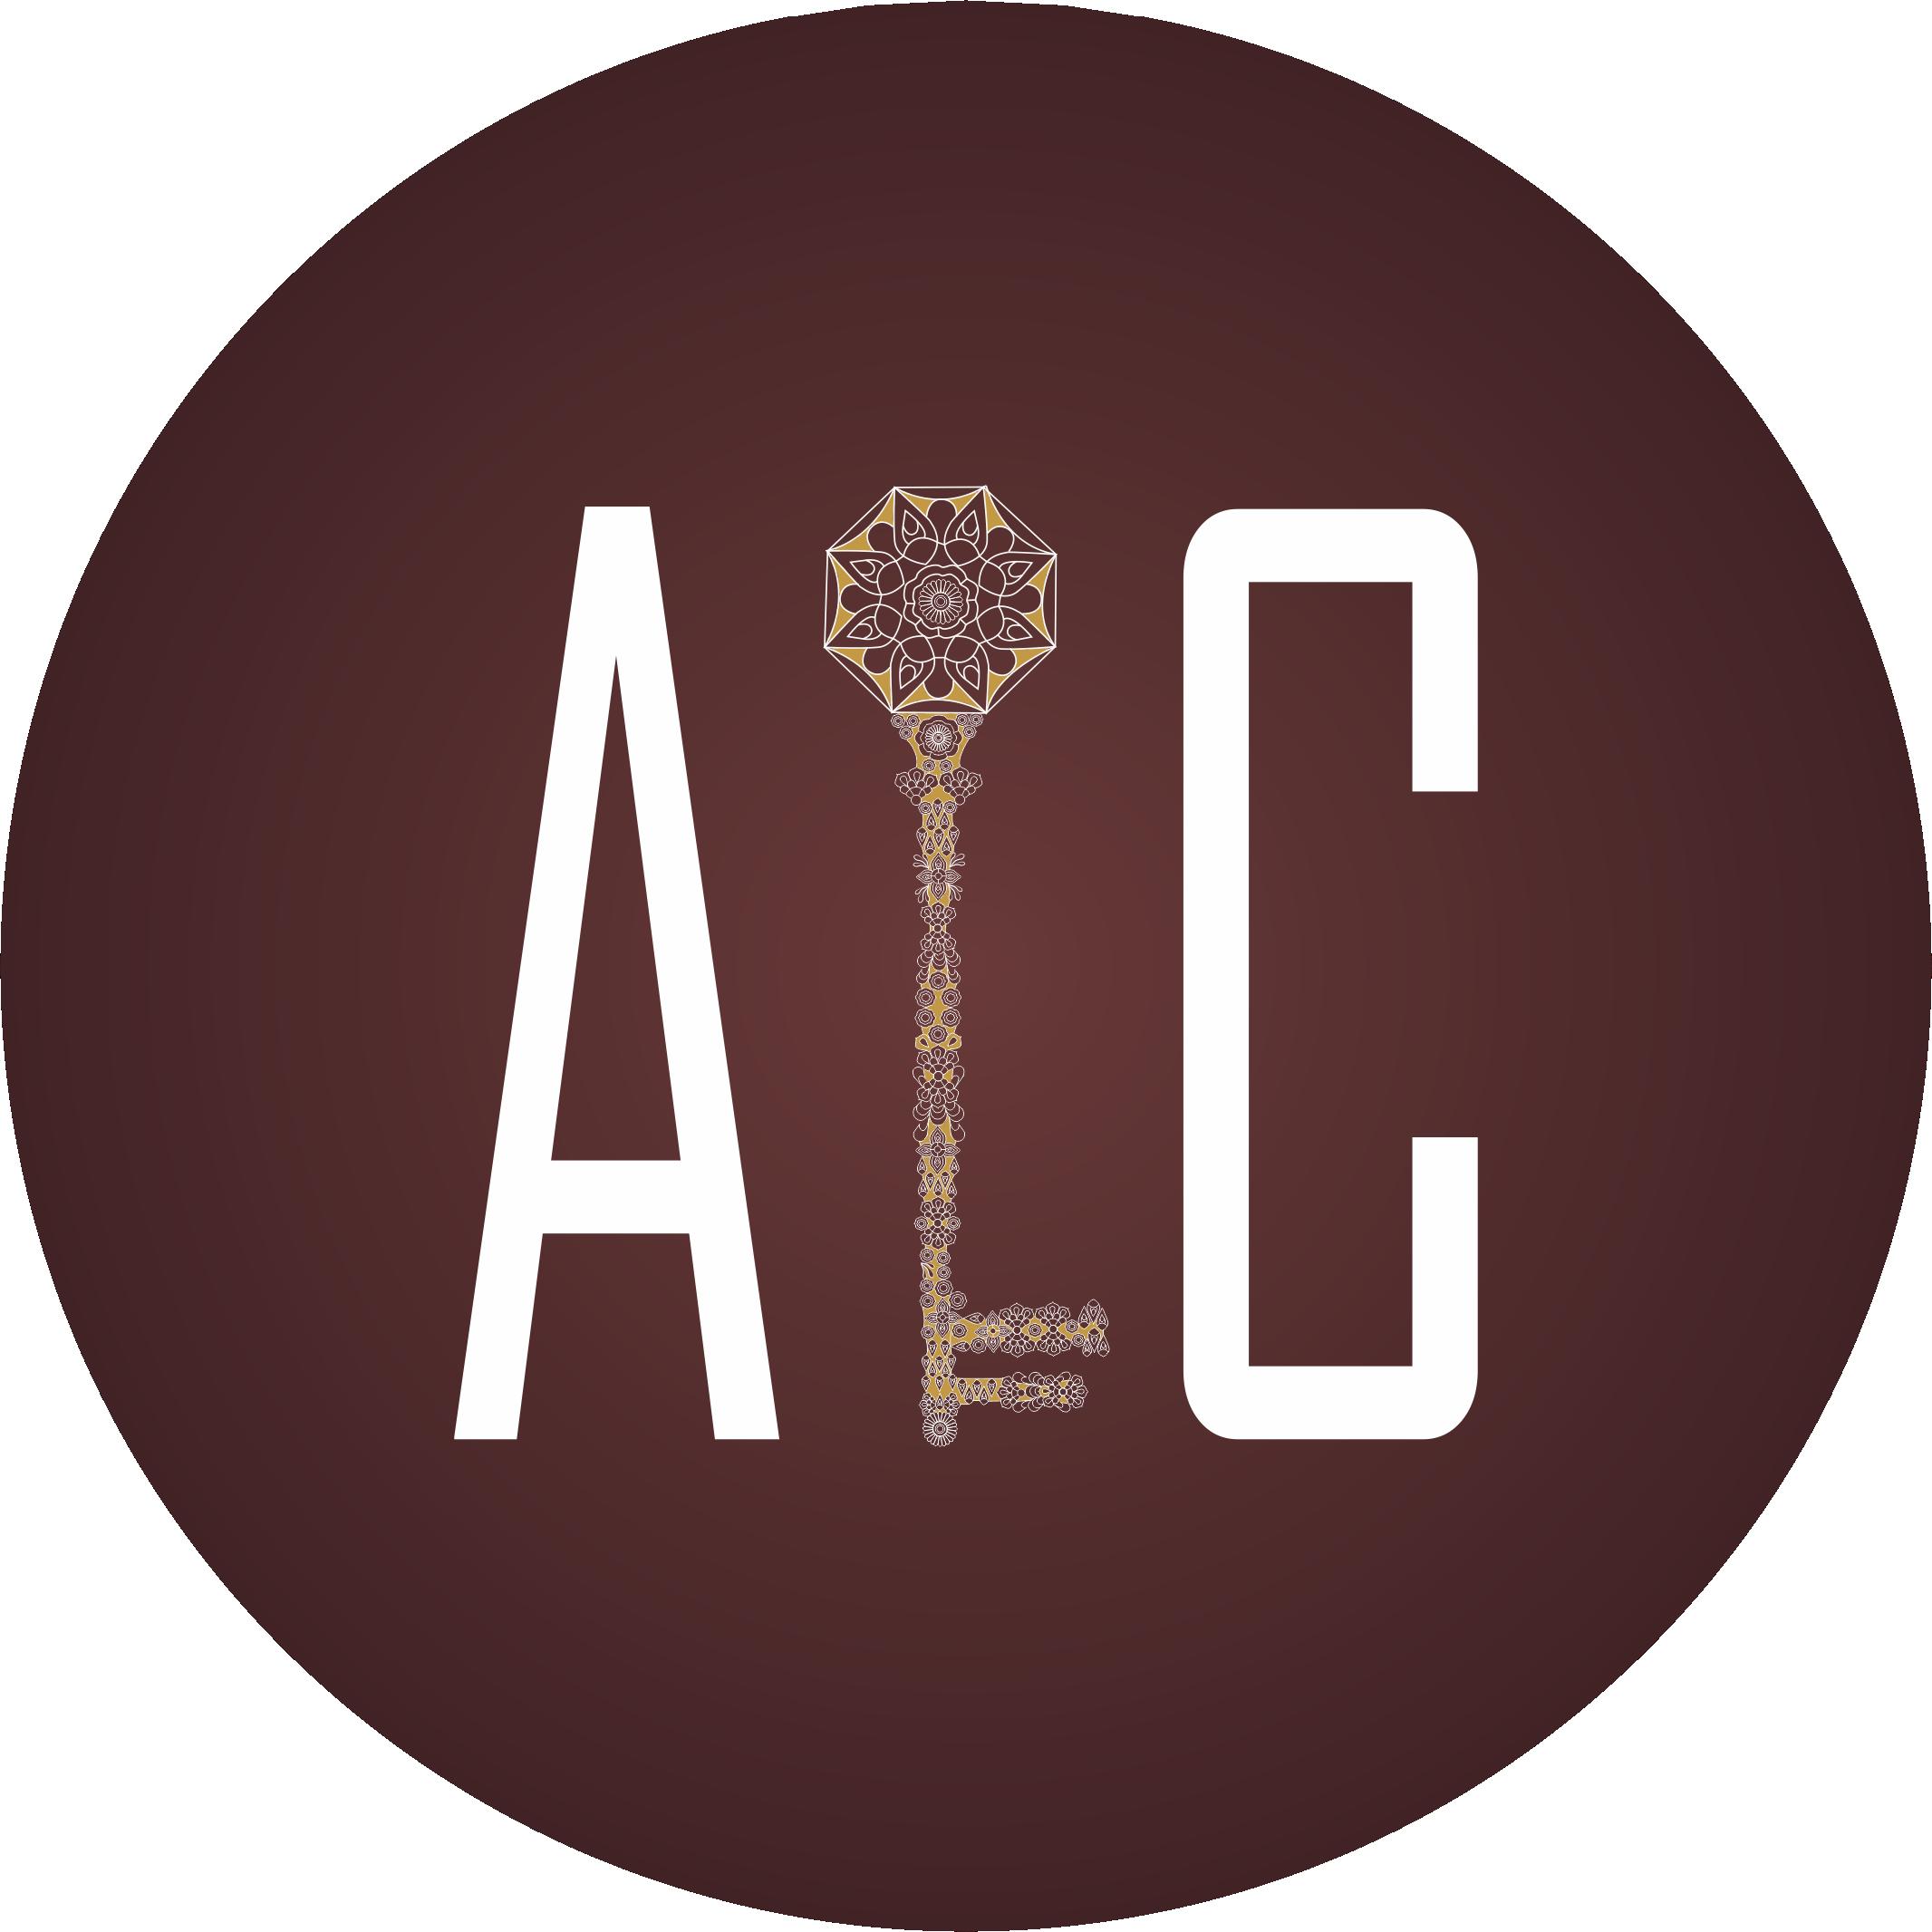 ALC - Emlak Yönetim